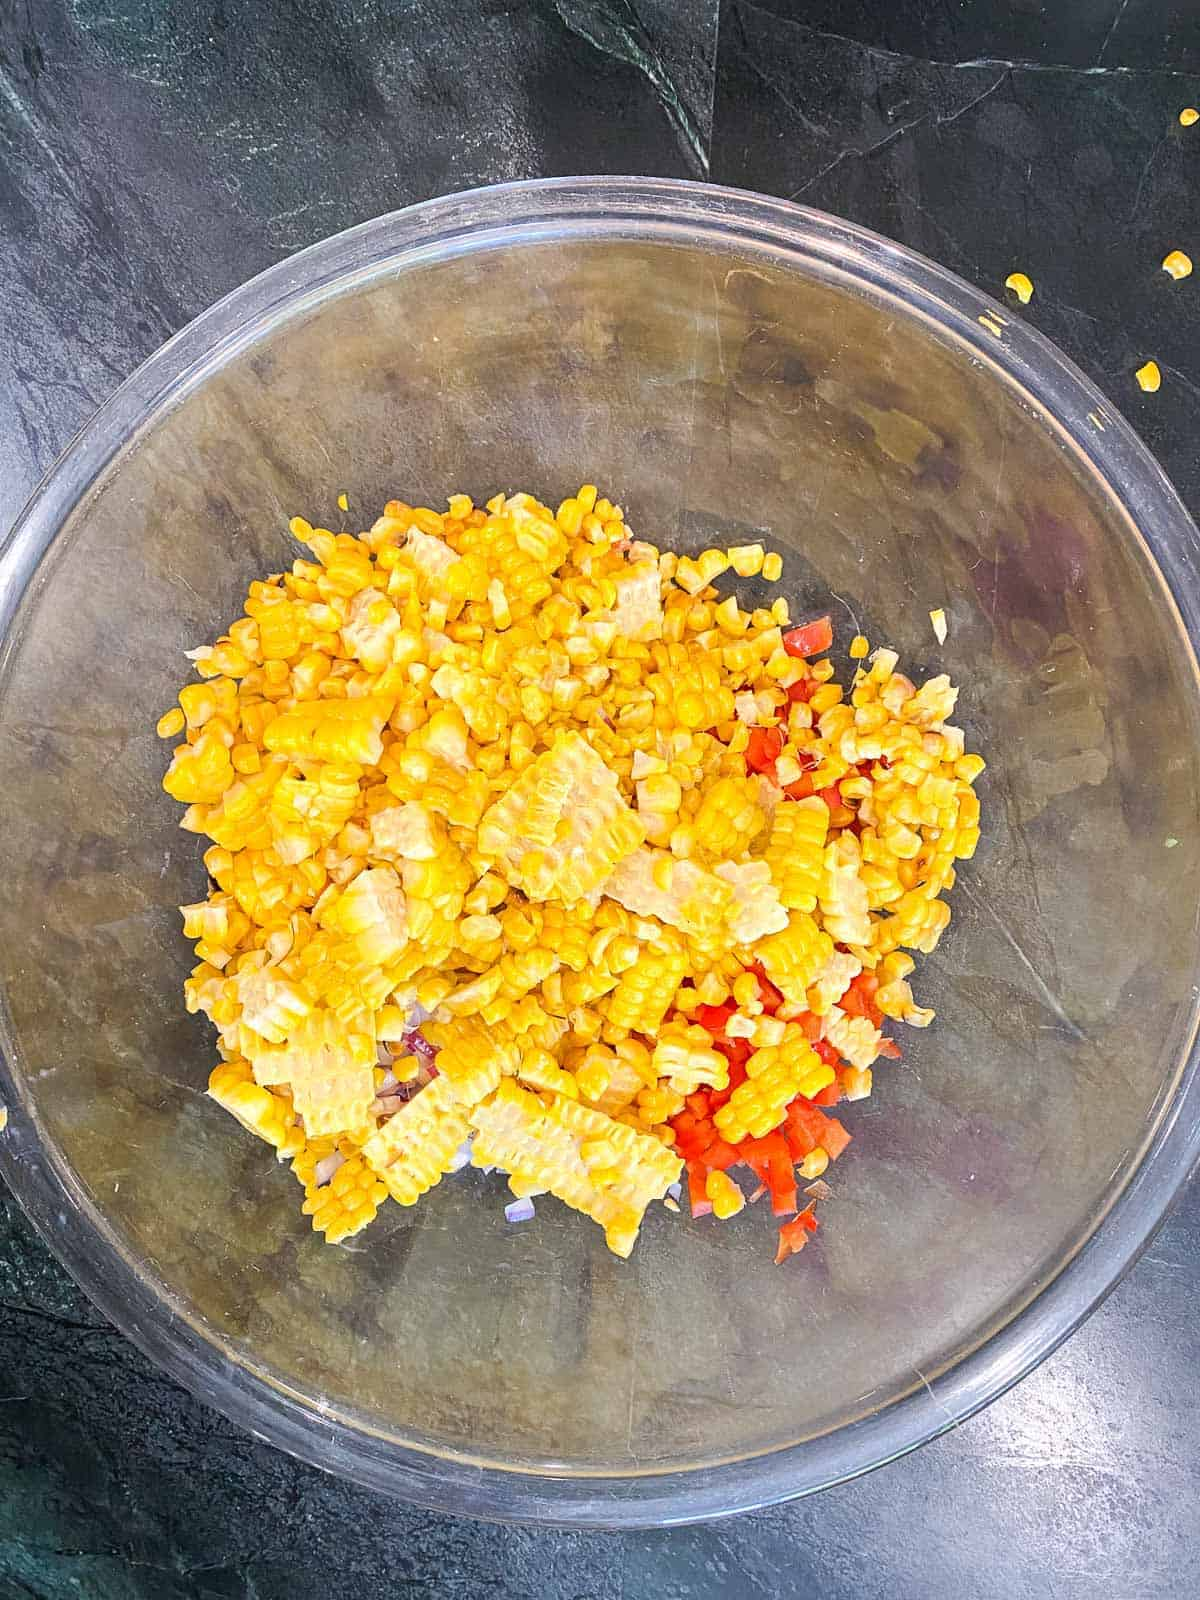 corn, red pepper, onions, serranos in a bowl